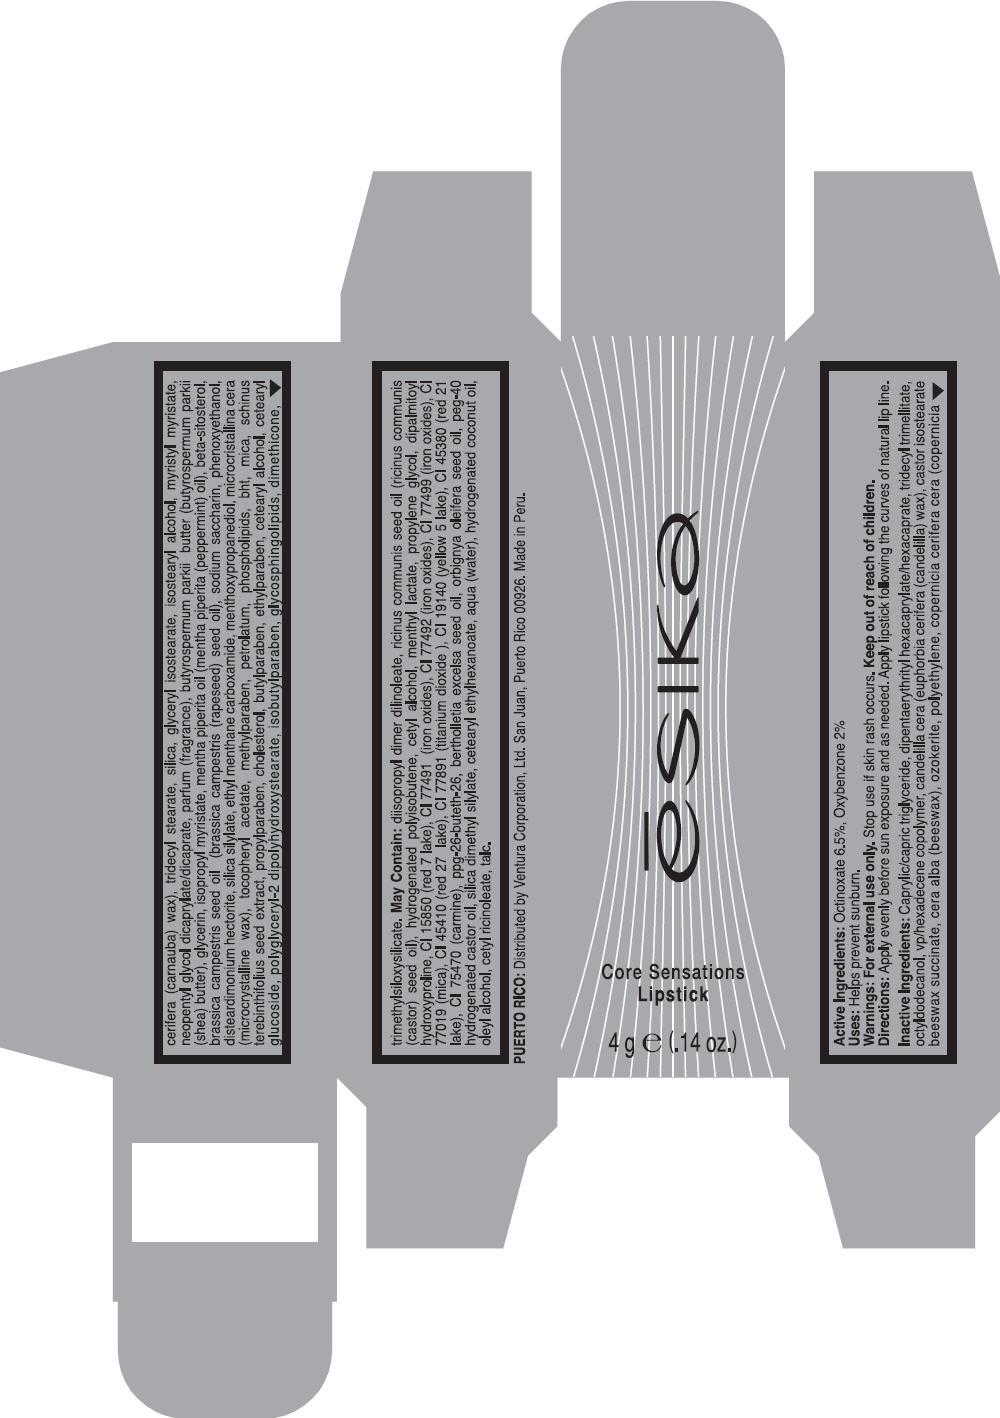 Esika (Octinoxate And Oxybenzone) Lipstick [Ventura Corporation (San Juan, P.r)]